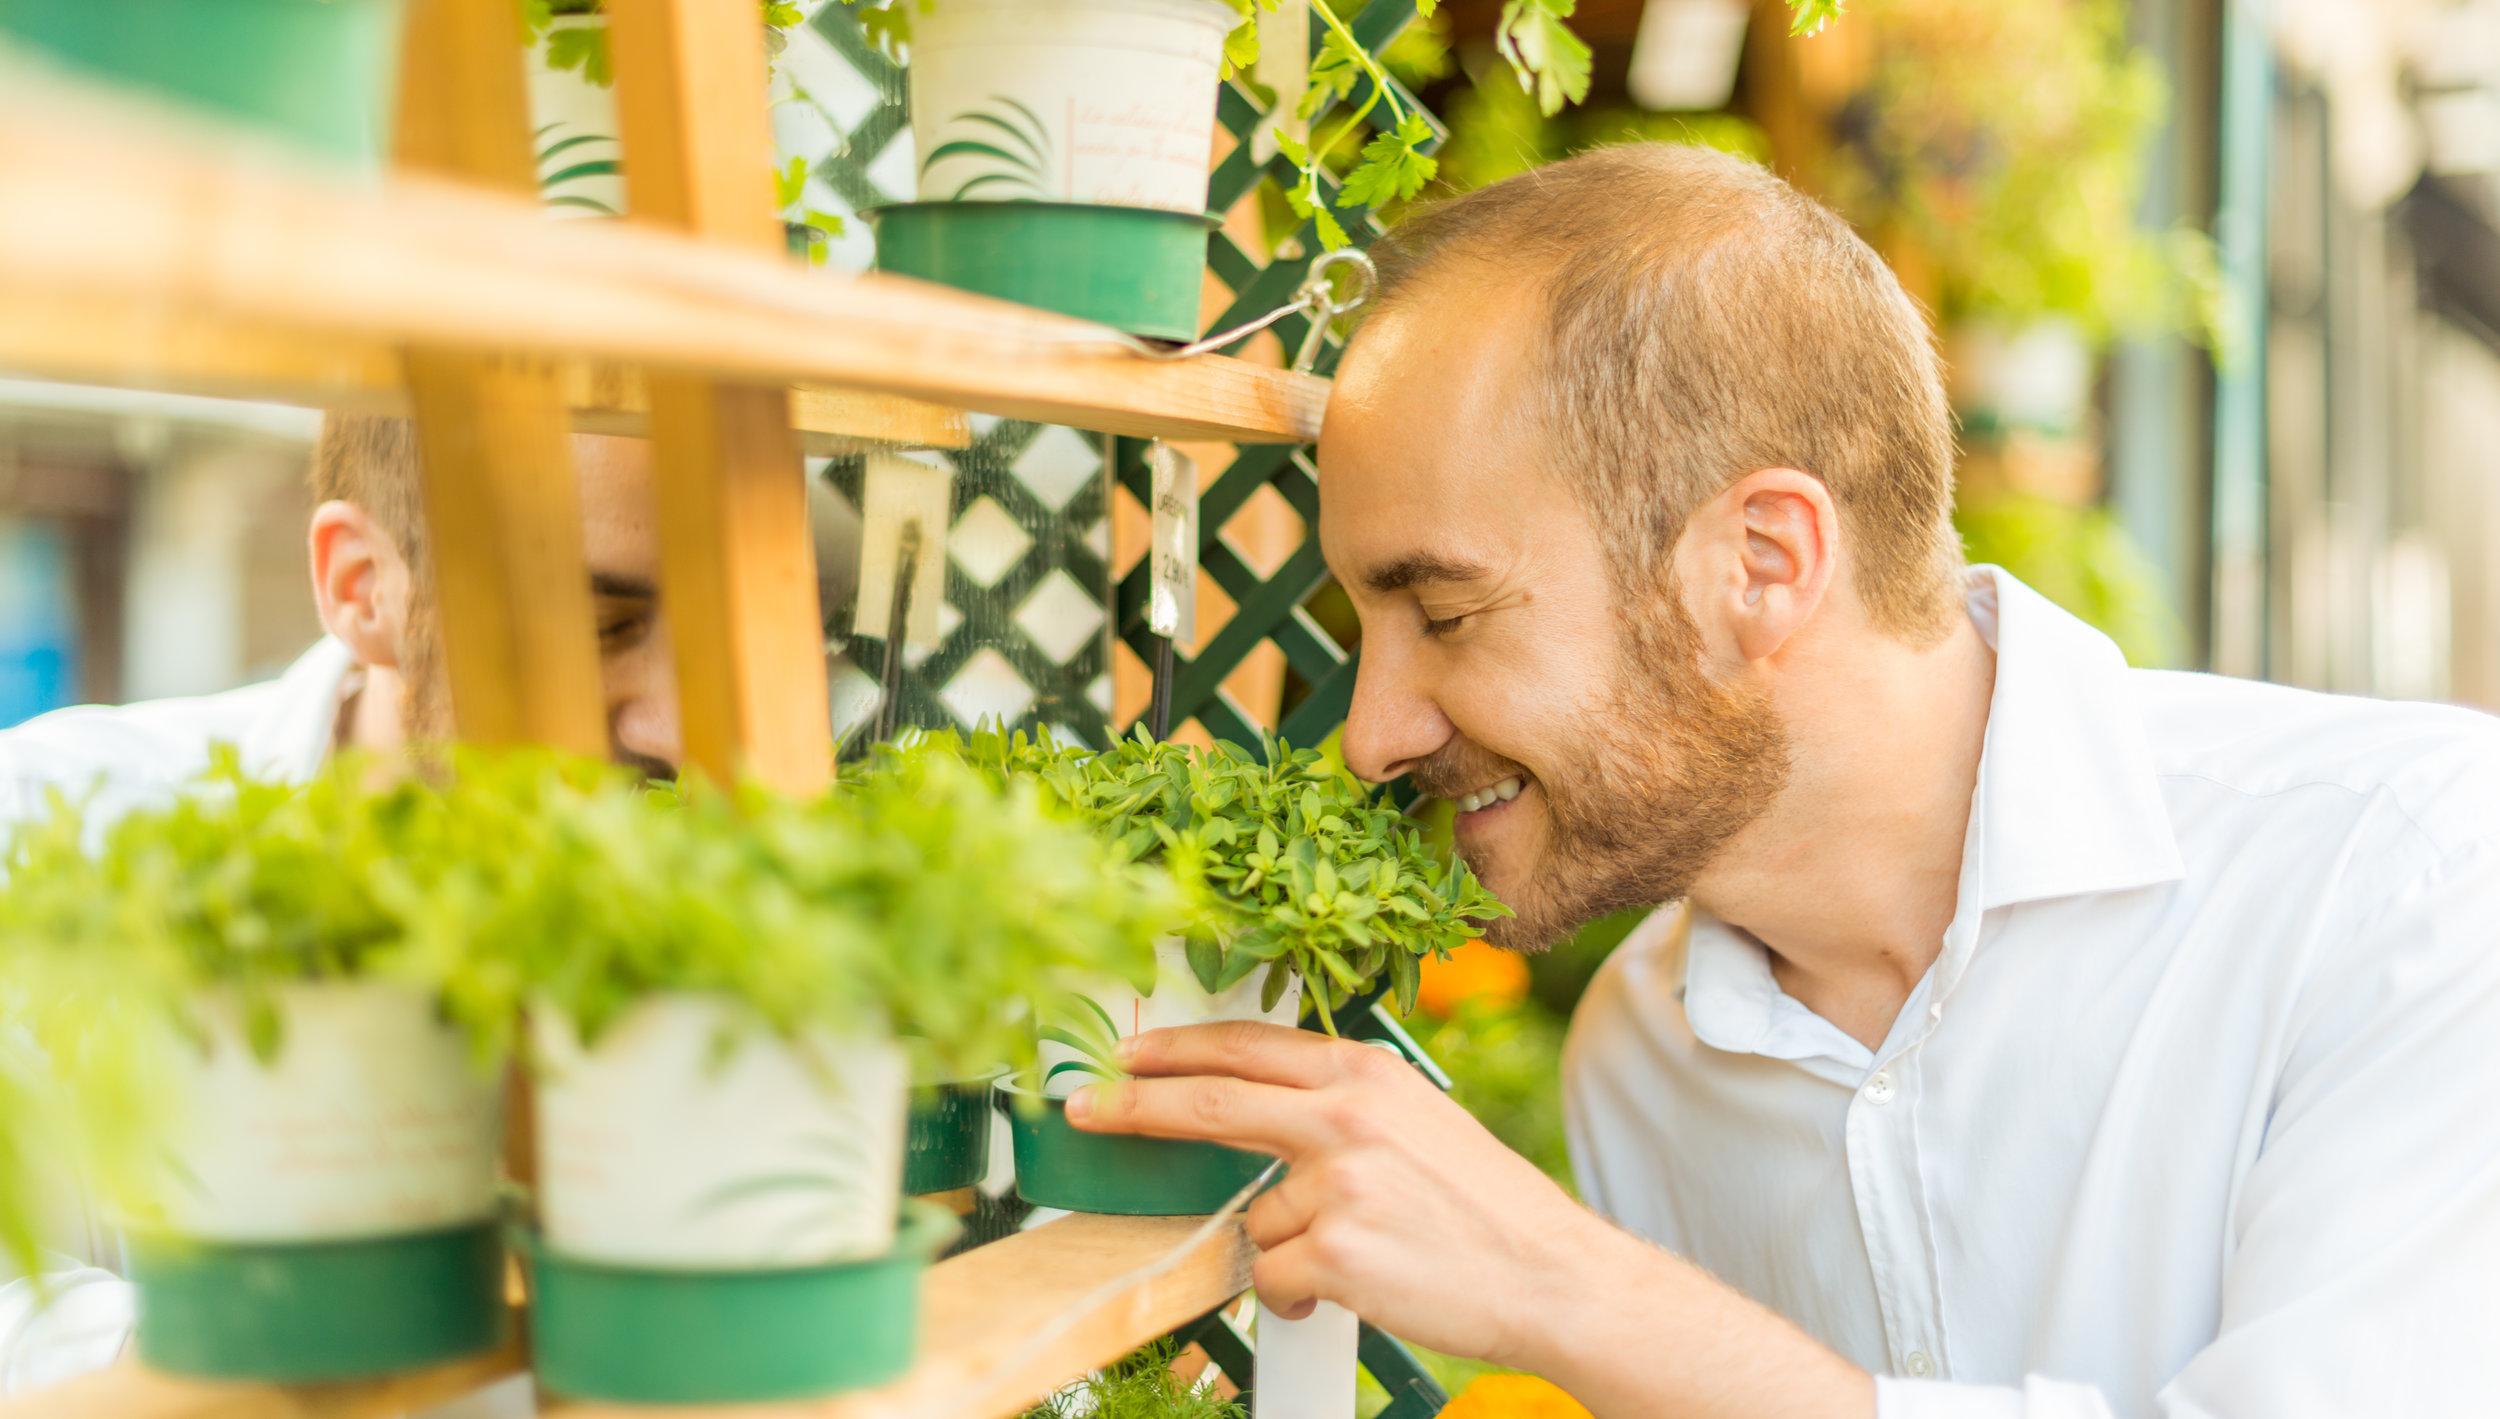 Man Smelling plant Smile.jpg